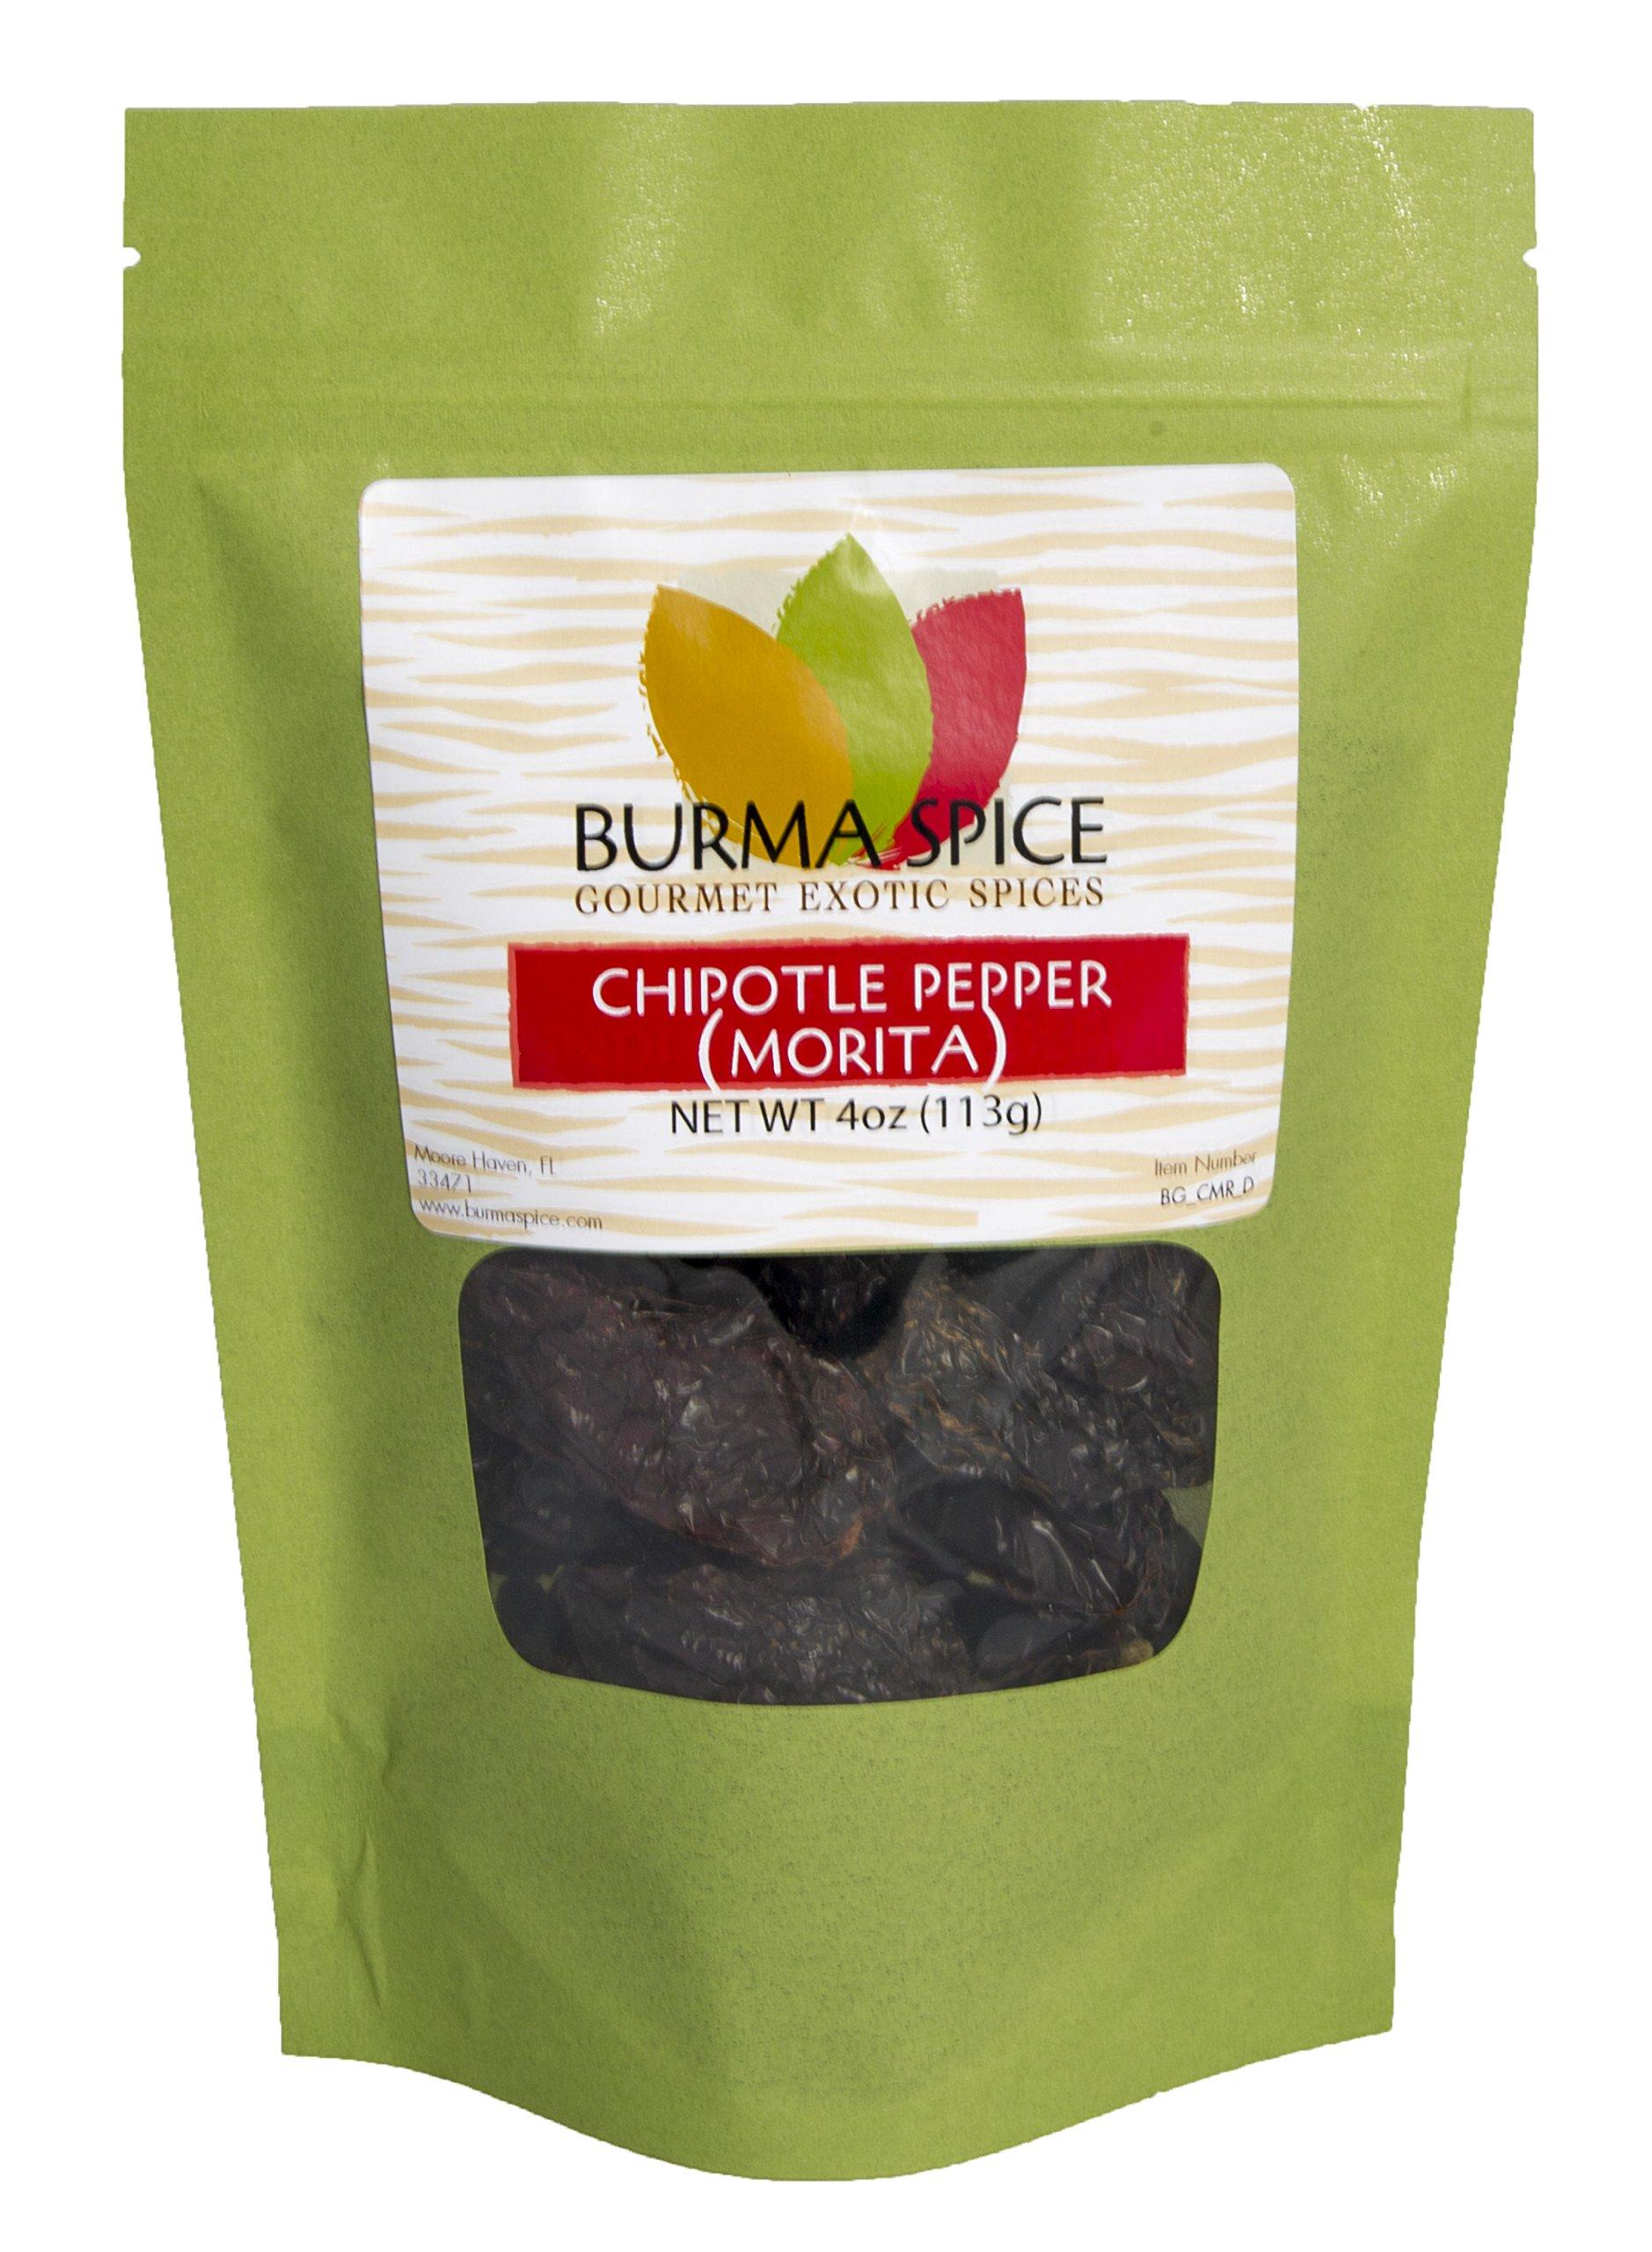 Dried Morita Chipotle Pepper Smokey Flavor Chile Kosher (4oz.) by Burma Spice (Image #1)